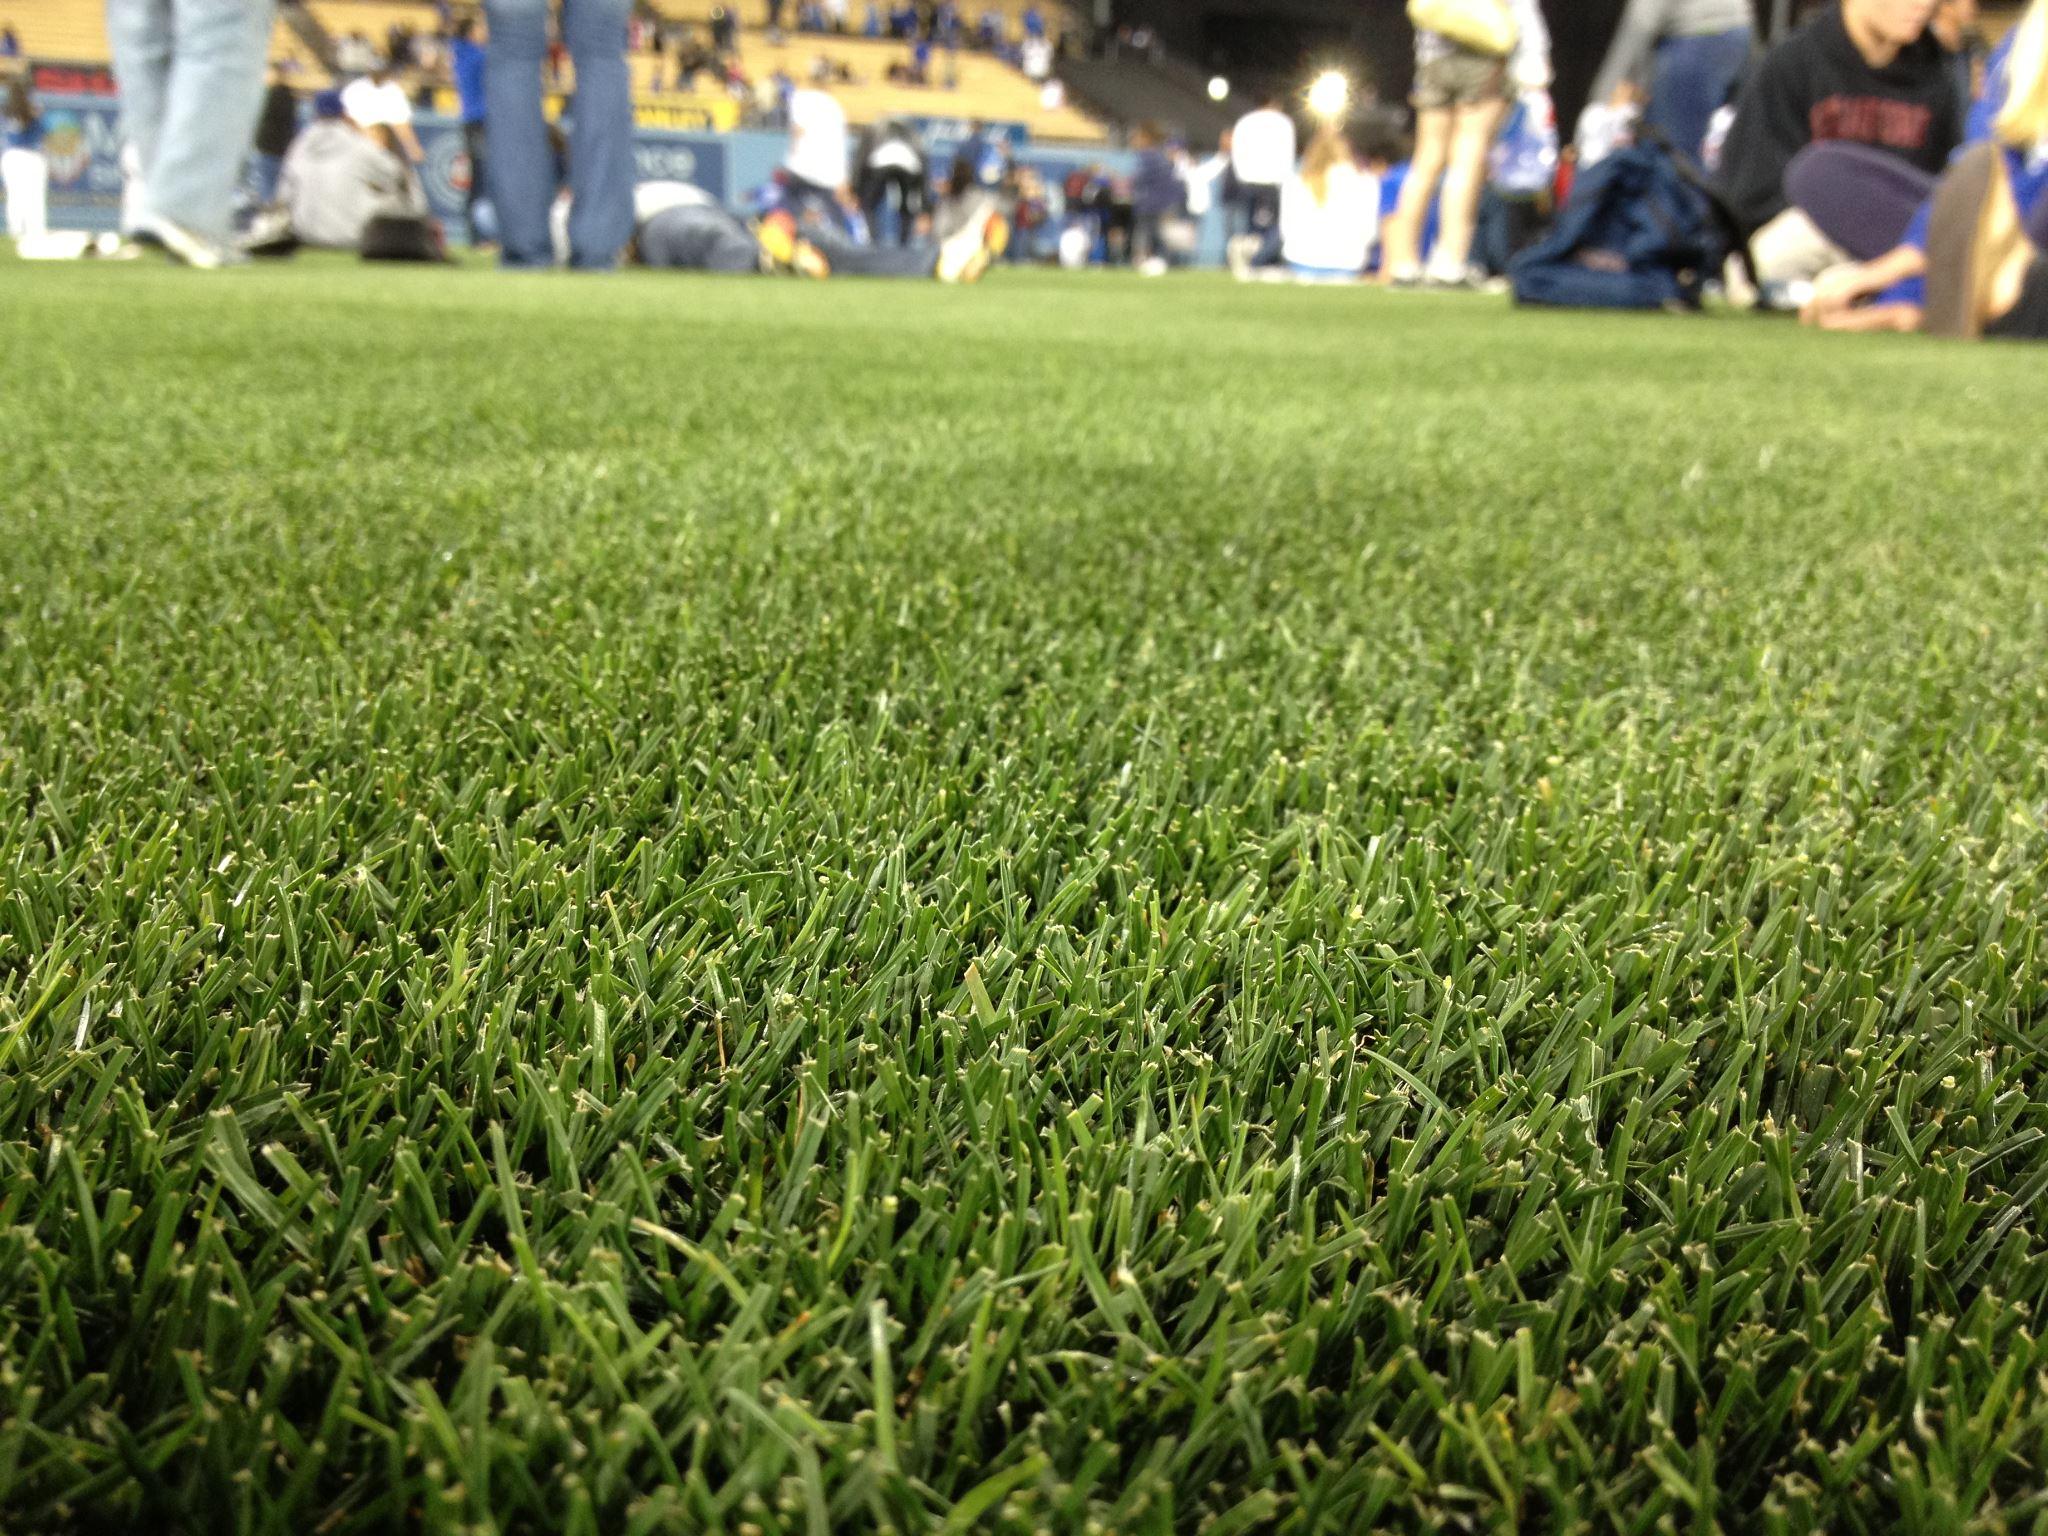 Los Angeles Dodgers baseball field